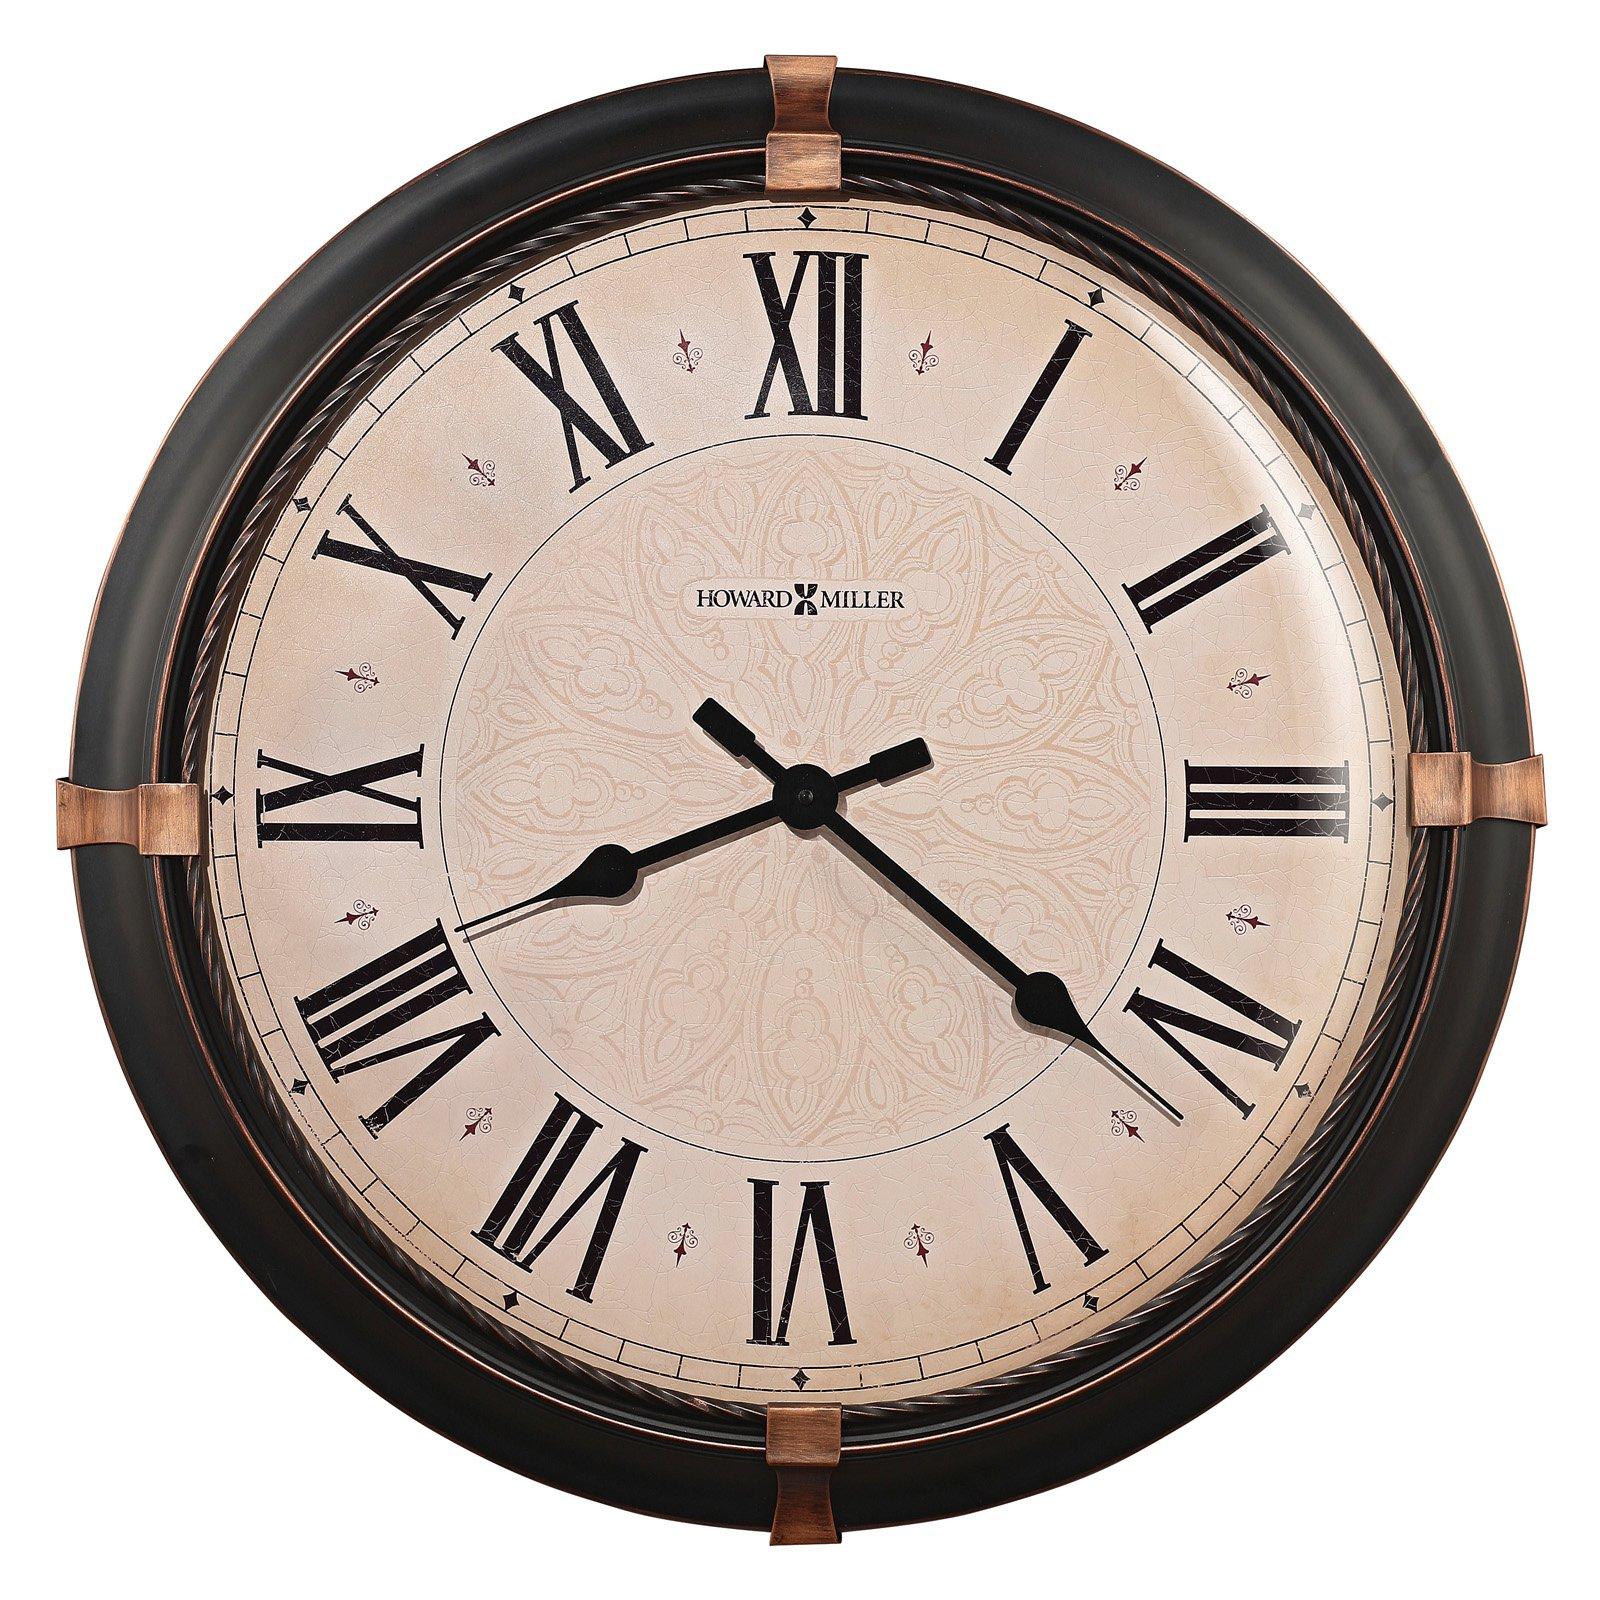 Howard Miller 625-498 Atwater 24 in. Wall Clock by Howard Miller